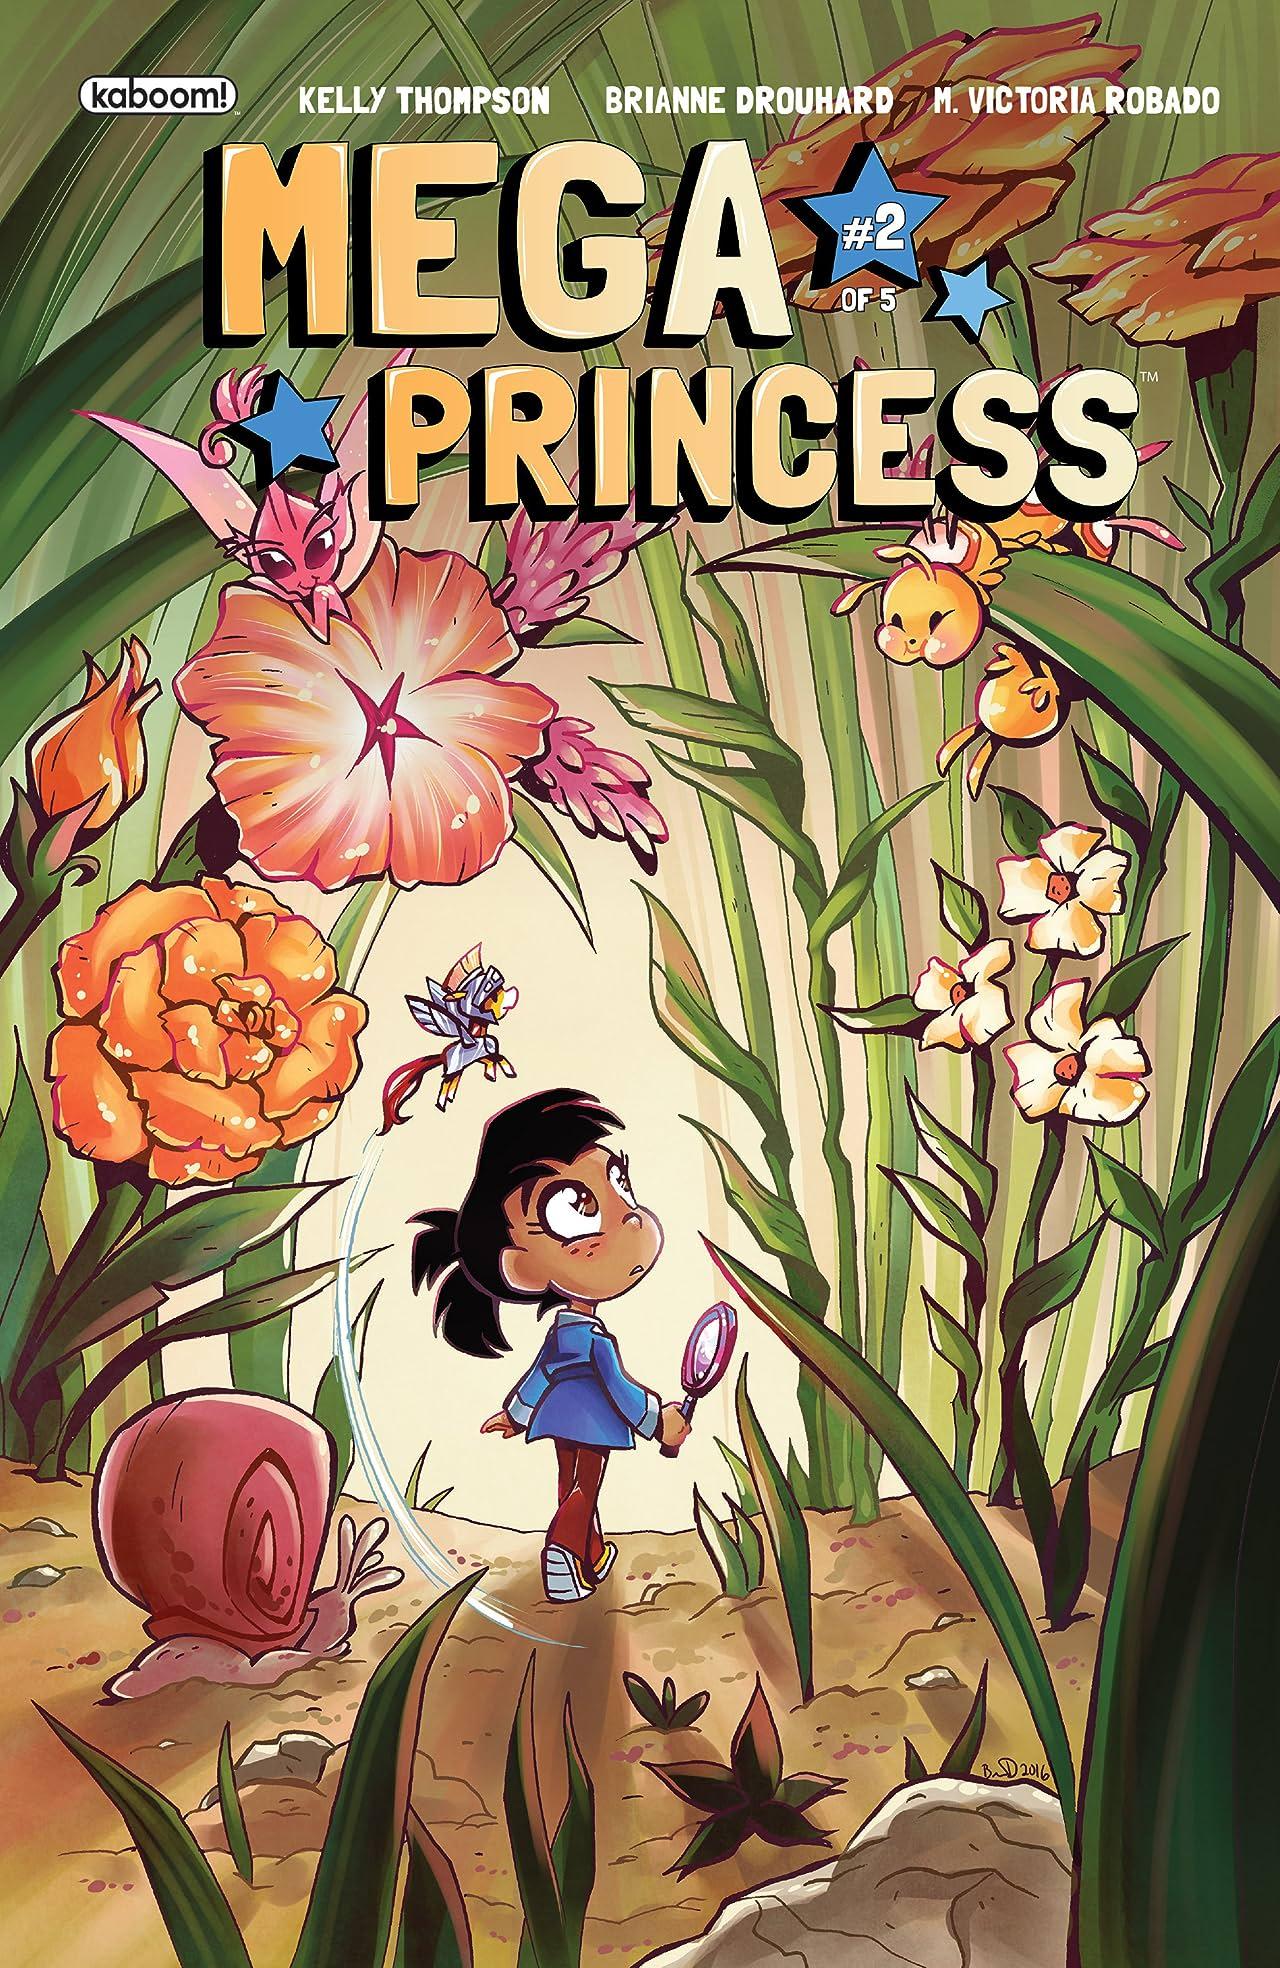 Mega Princess #2 (of 5)